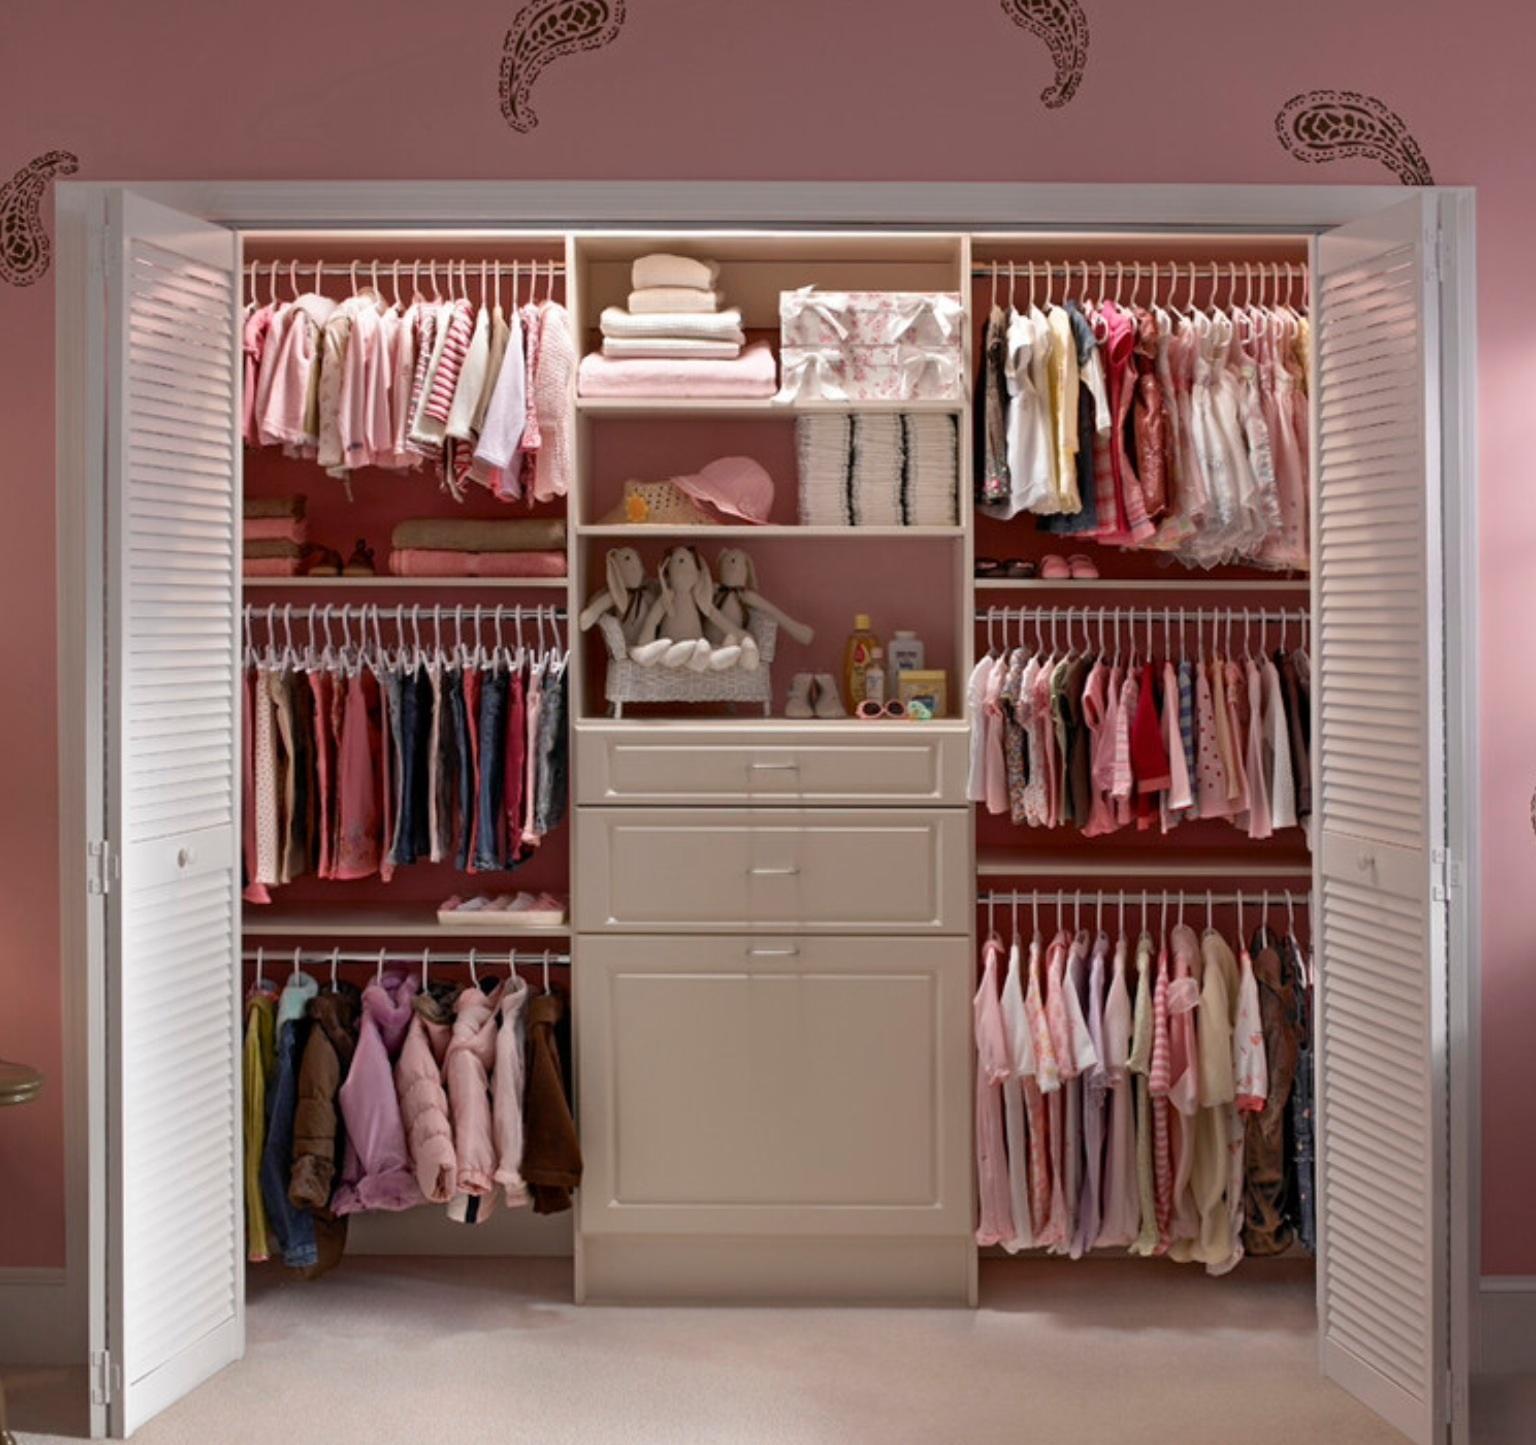 Идеи для гардеробной комнаты.